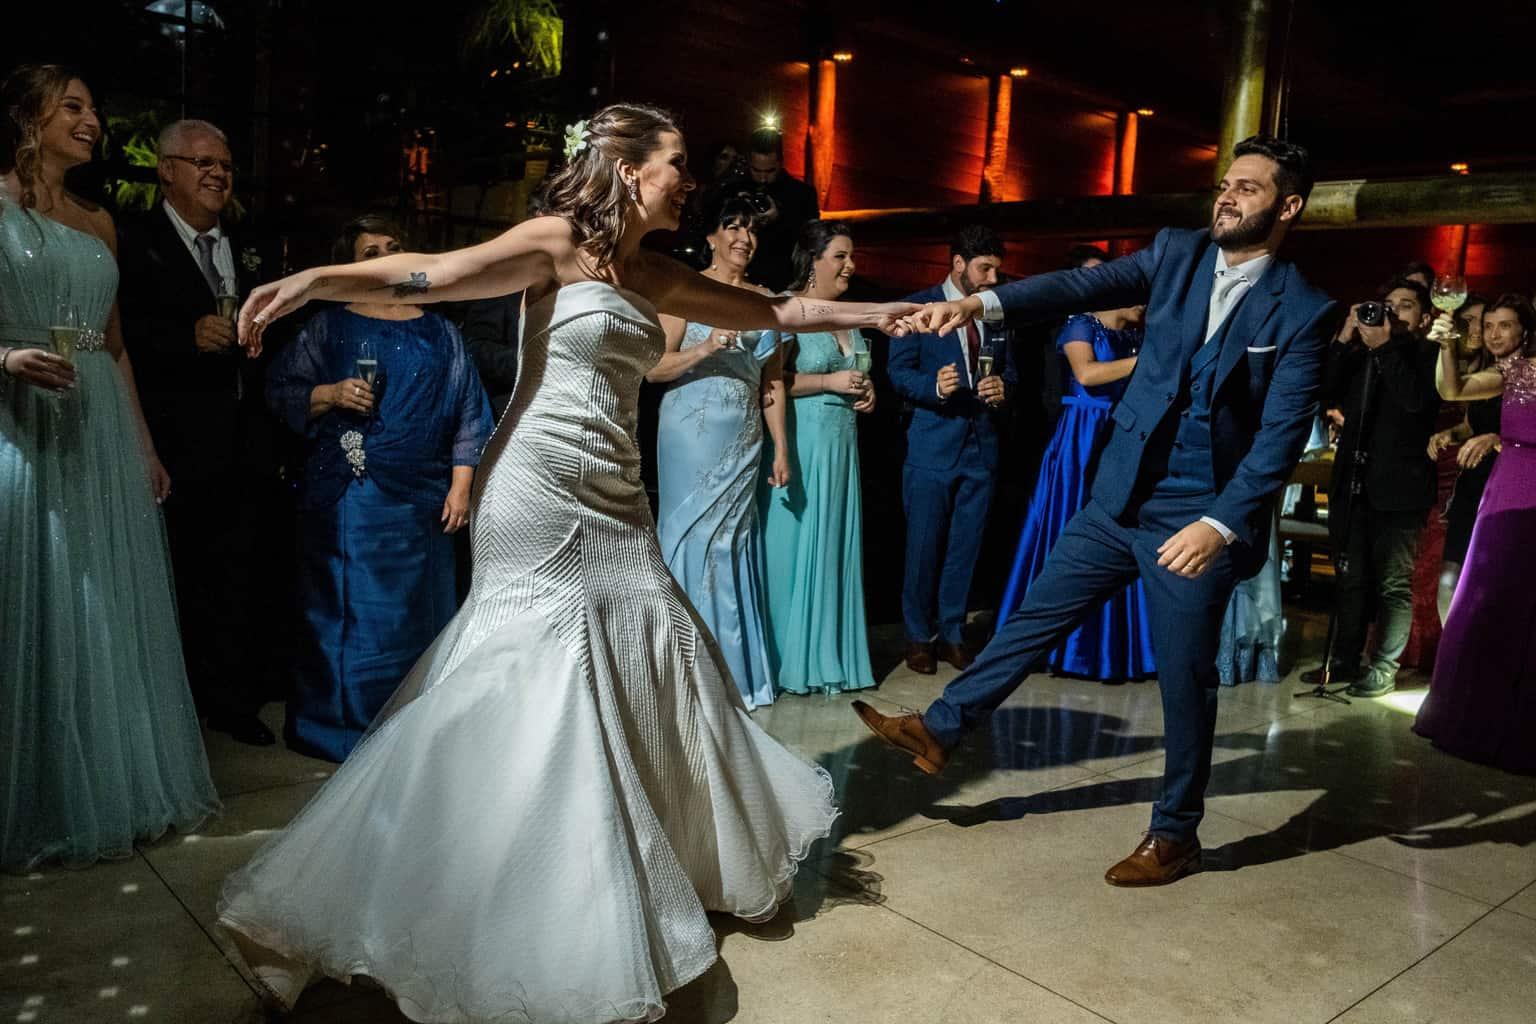 Bel-Benkler-eventos-Casamento-Ariane-e-Matheus-cerimonia-decoracao-contemporanea-fotografia-Rafael-Bigarelli-noivos-na-pista-Spazio-Giardini-62